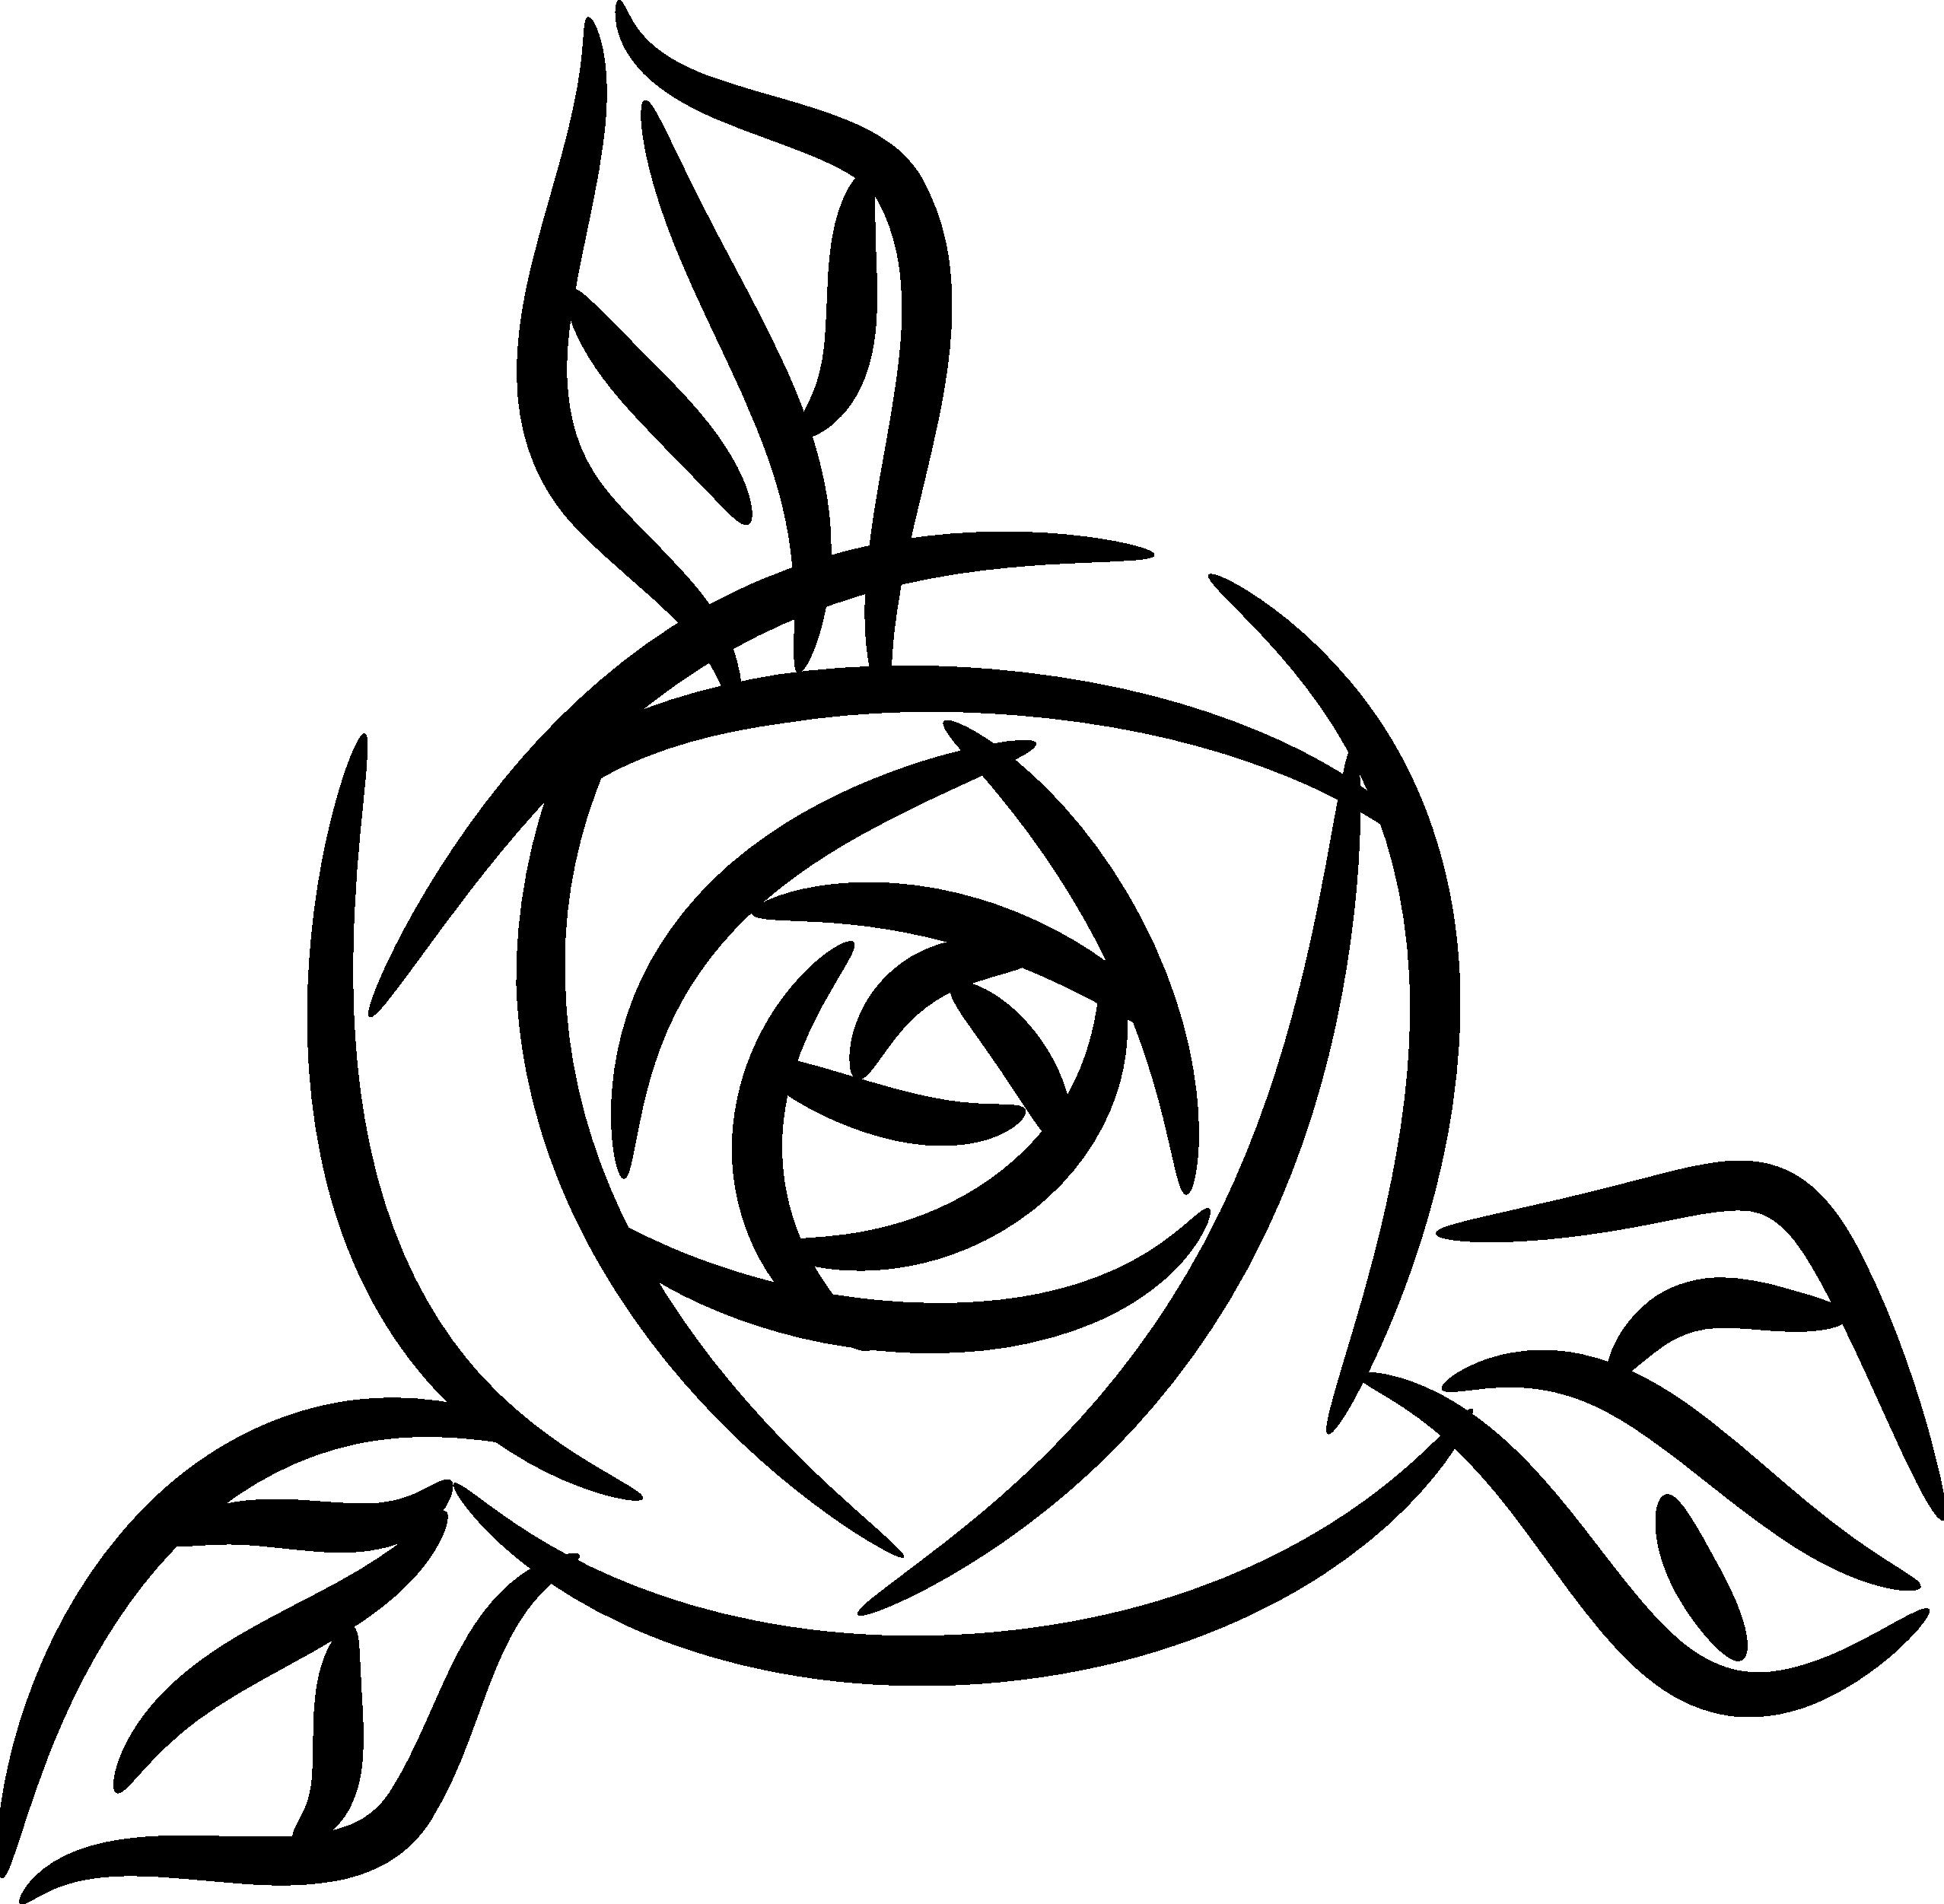 Black Rose Clipart-Black Rose Clipart-1